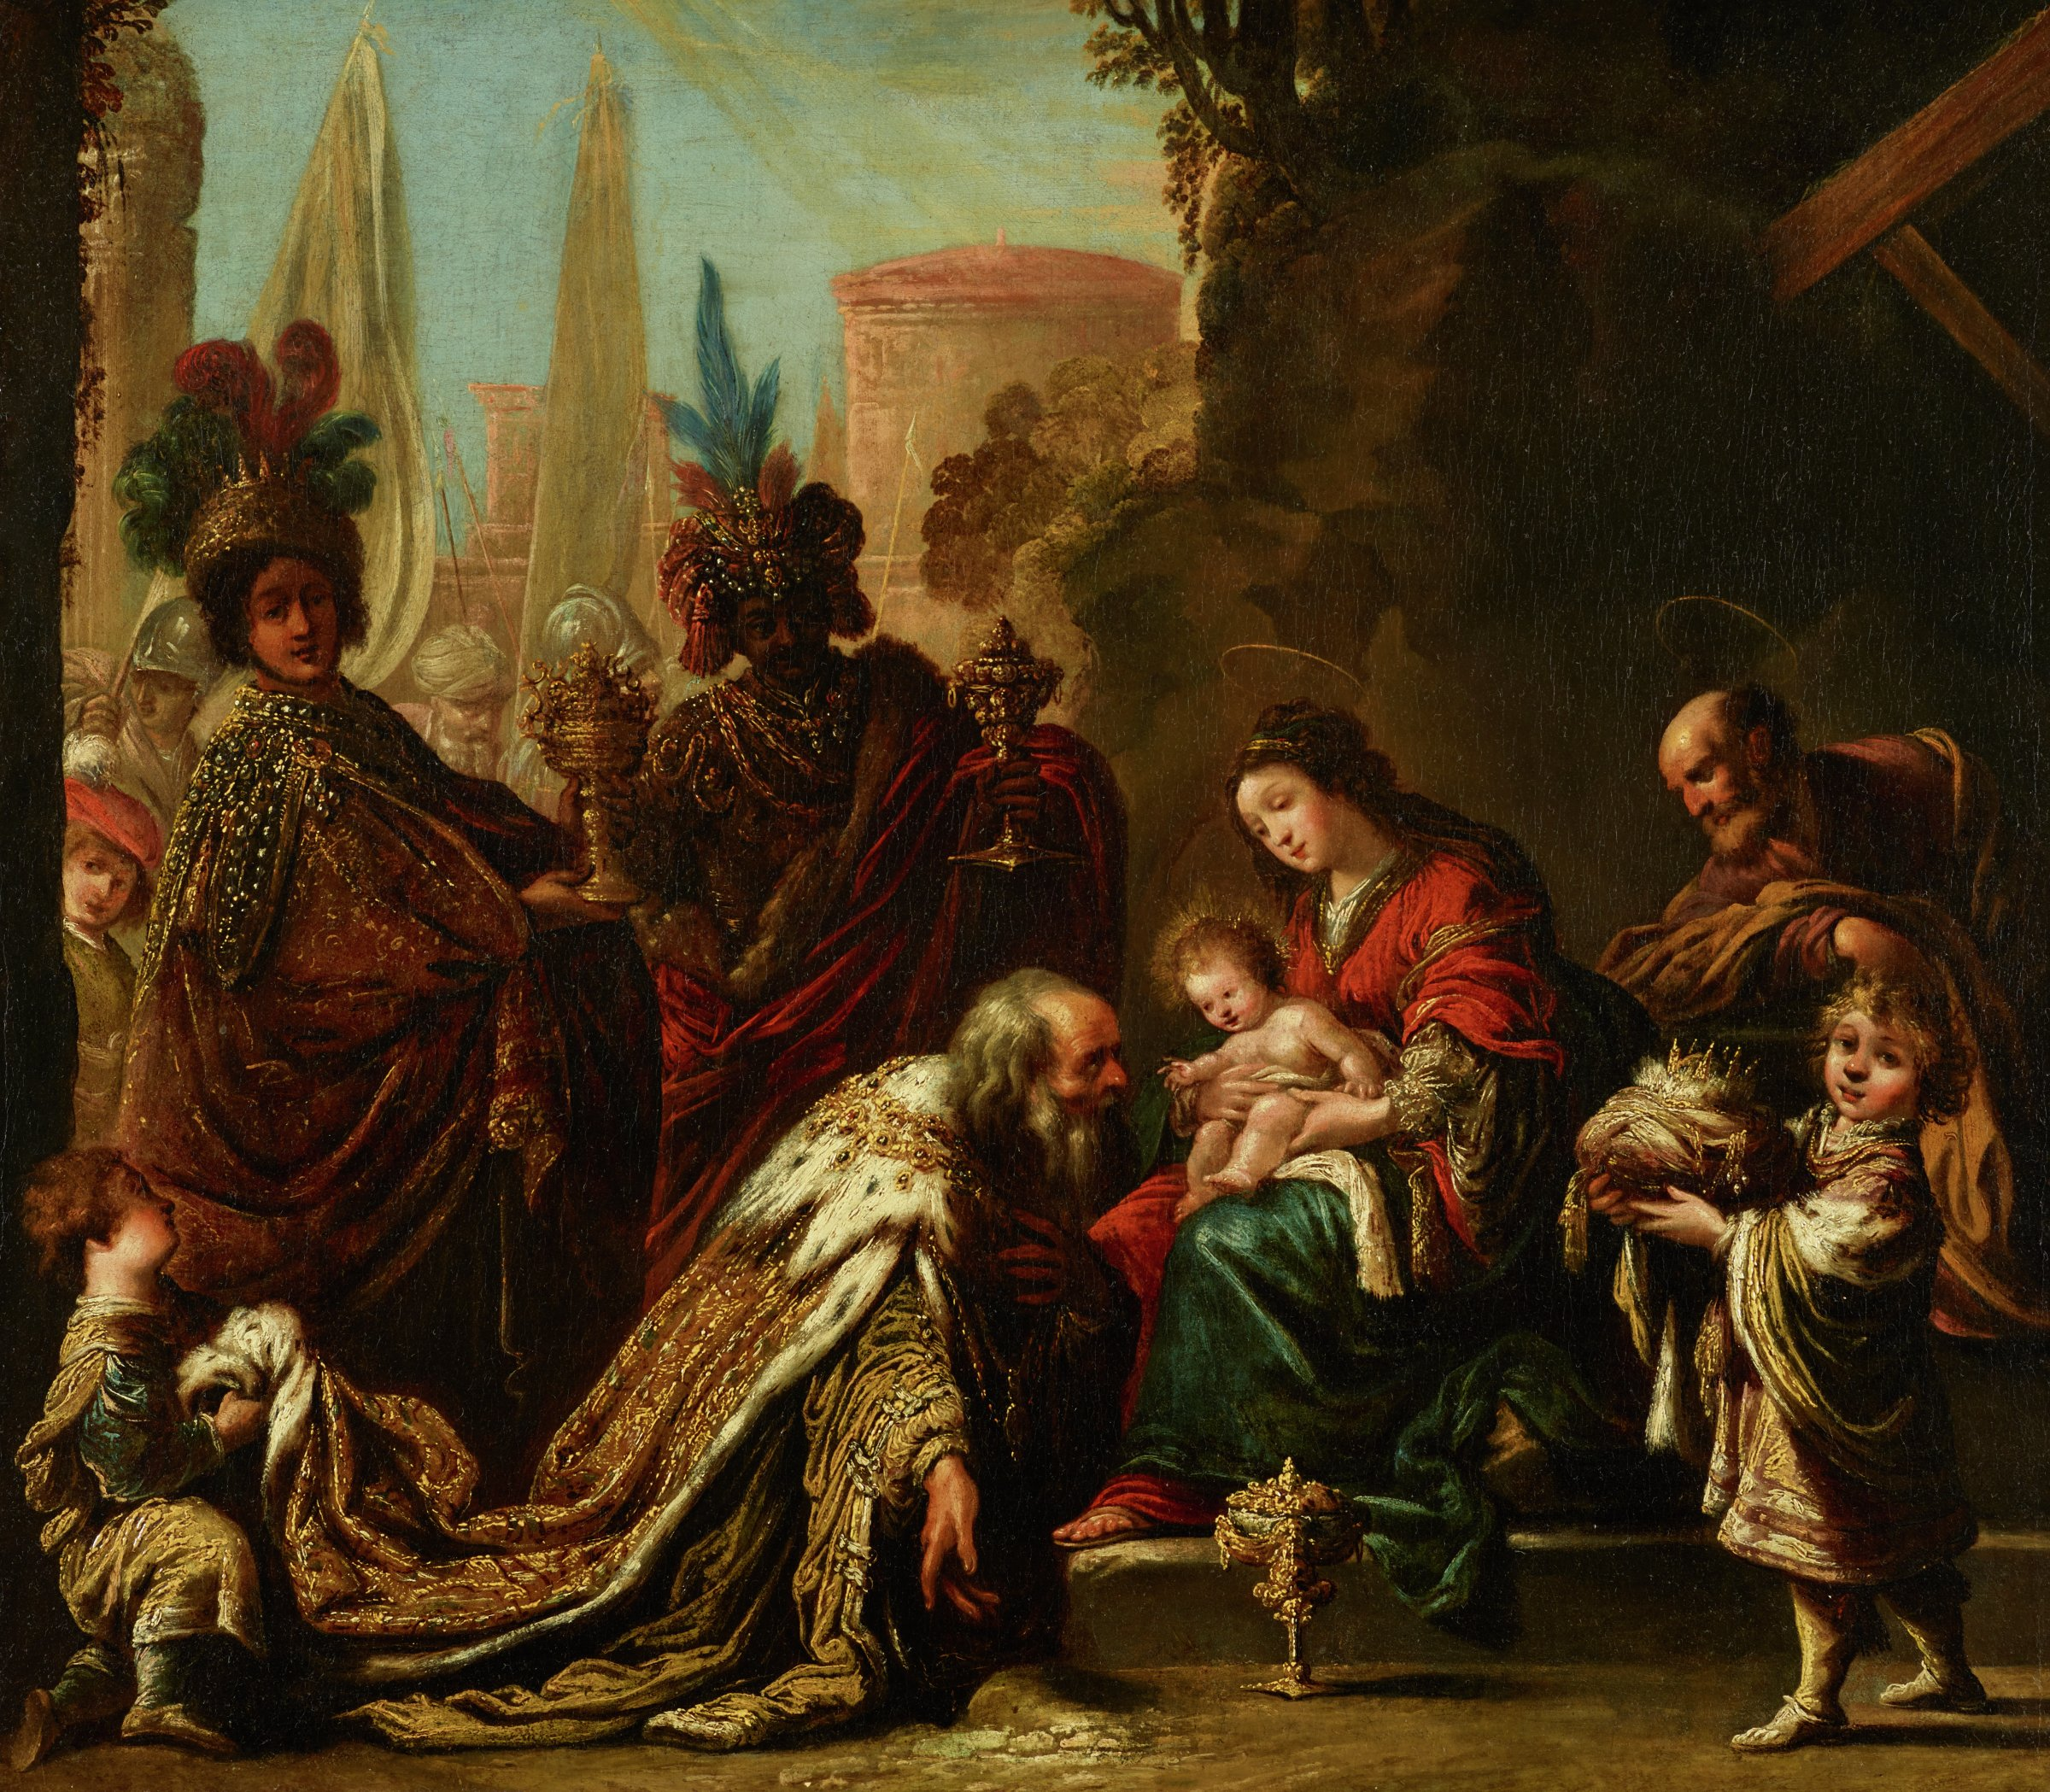 Adoration of the Magi, Claude Vignon, oil on canvas